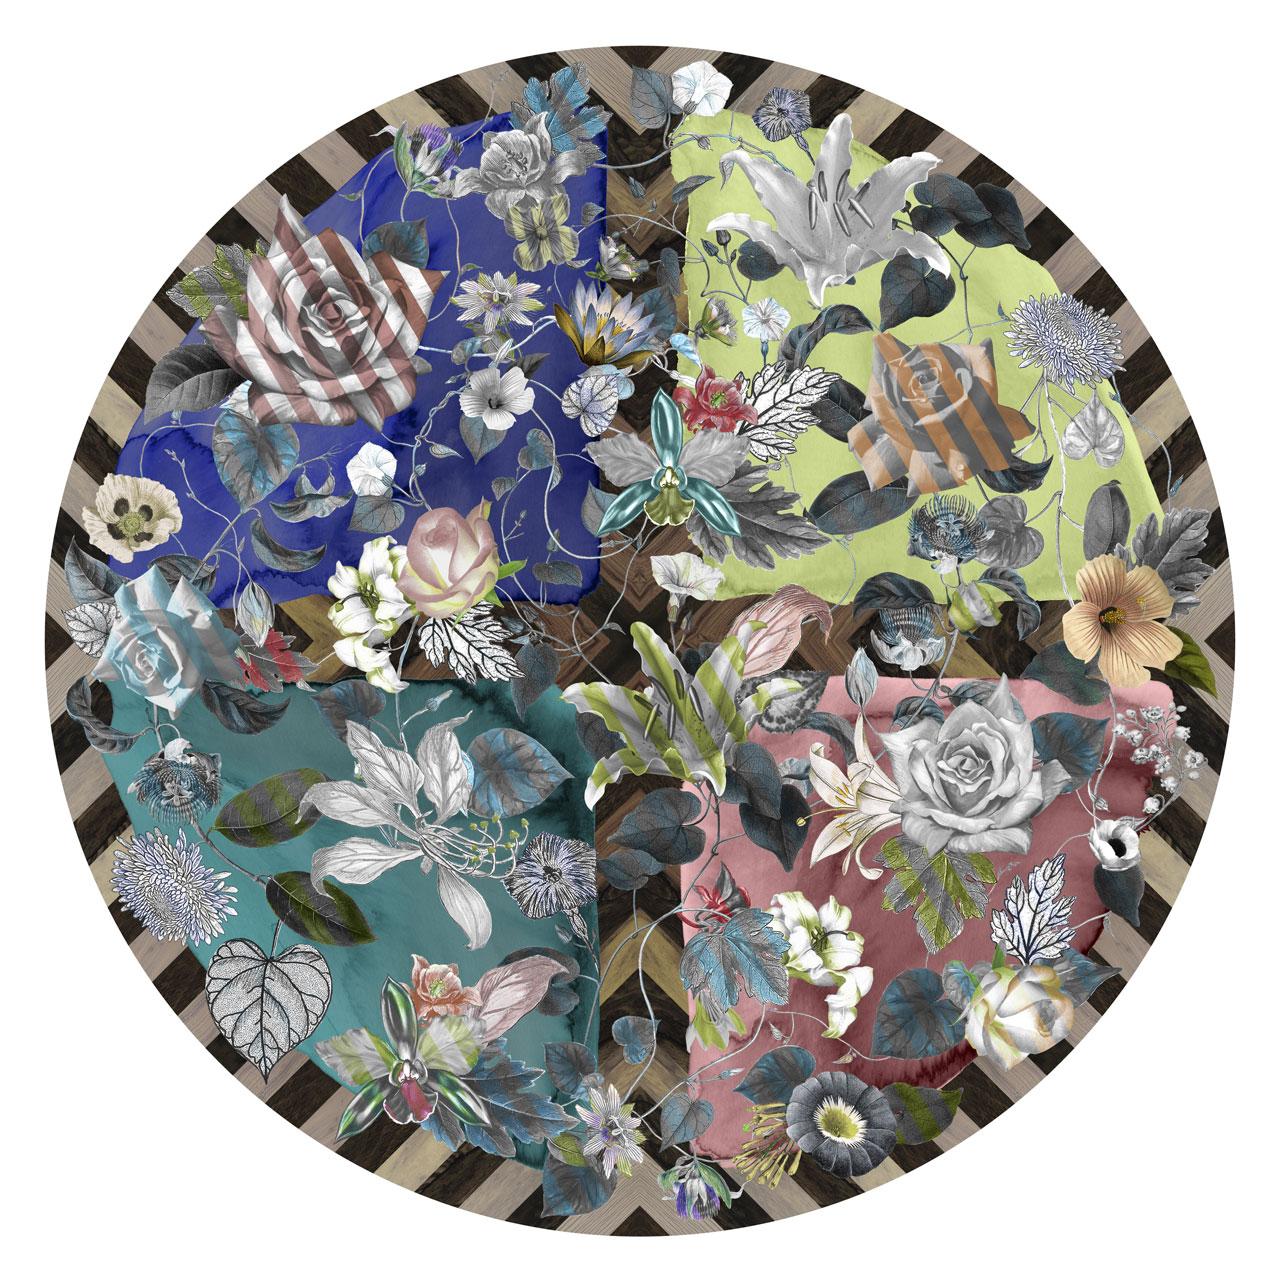 Malmaison carpet series byMaison Christian Lacroixfor the latest MOOOI rugs collection.